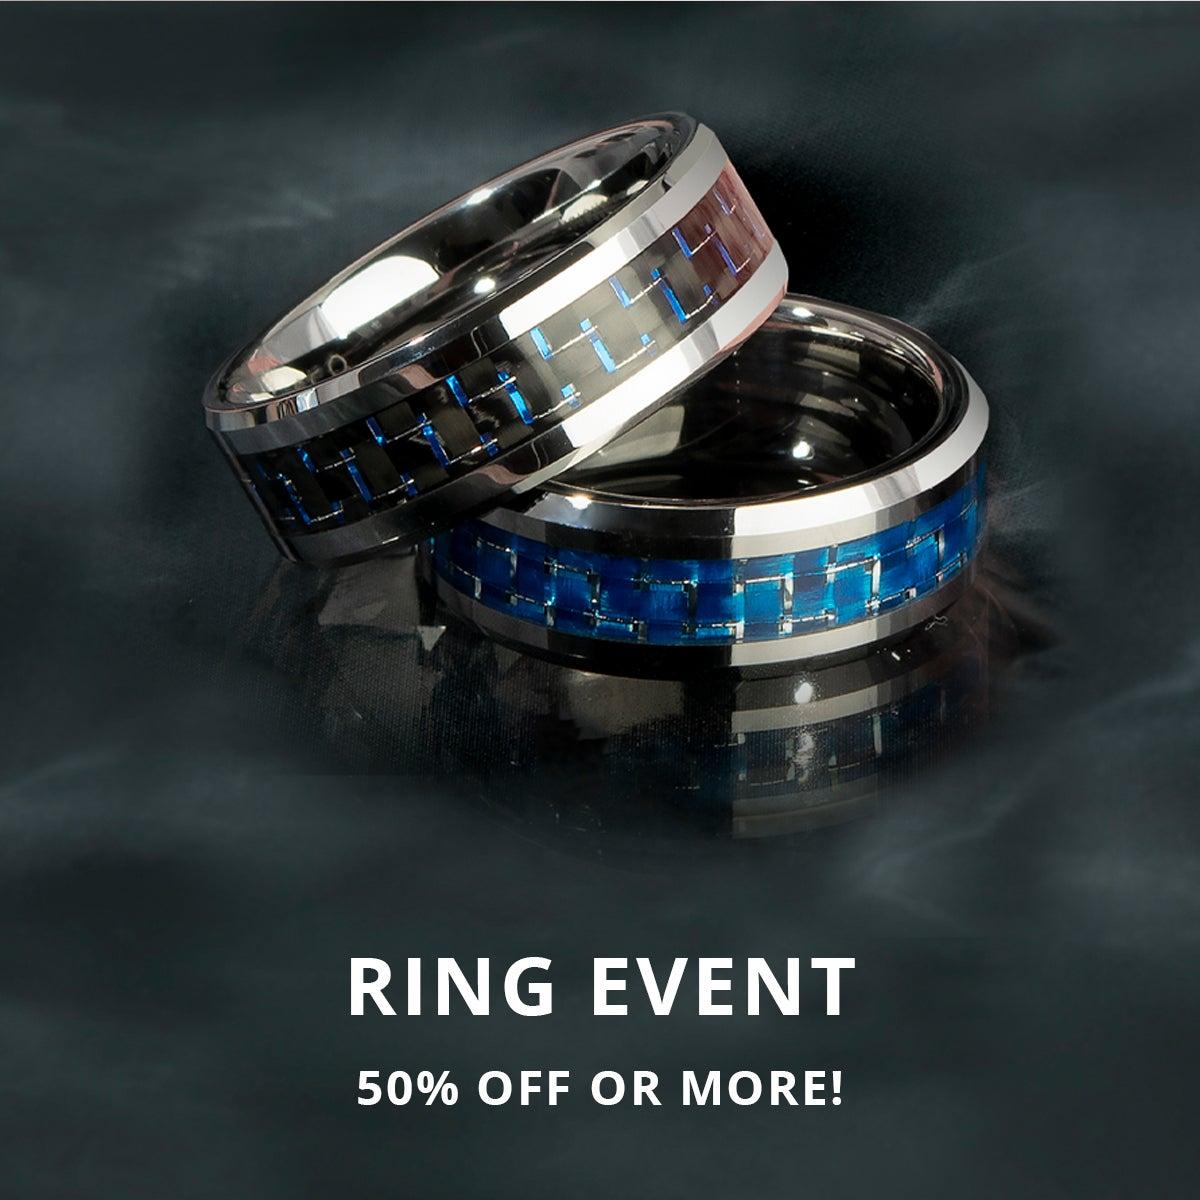 JG ring event